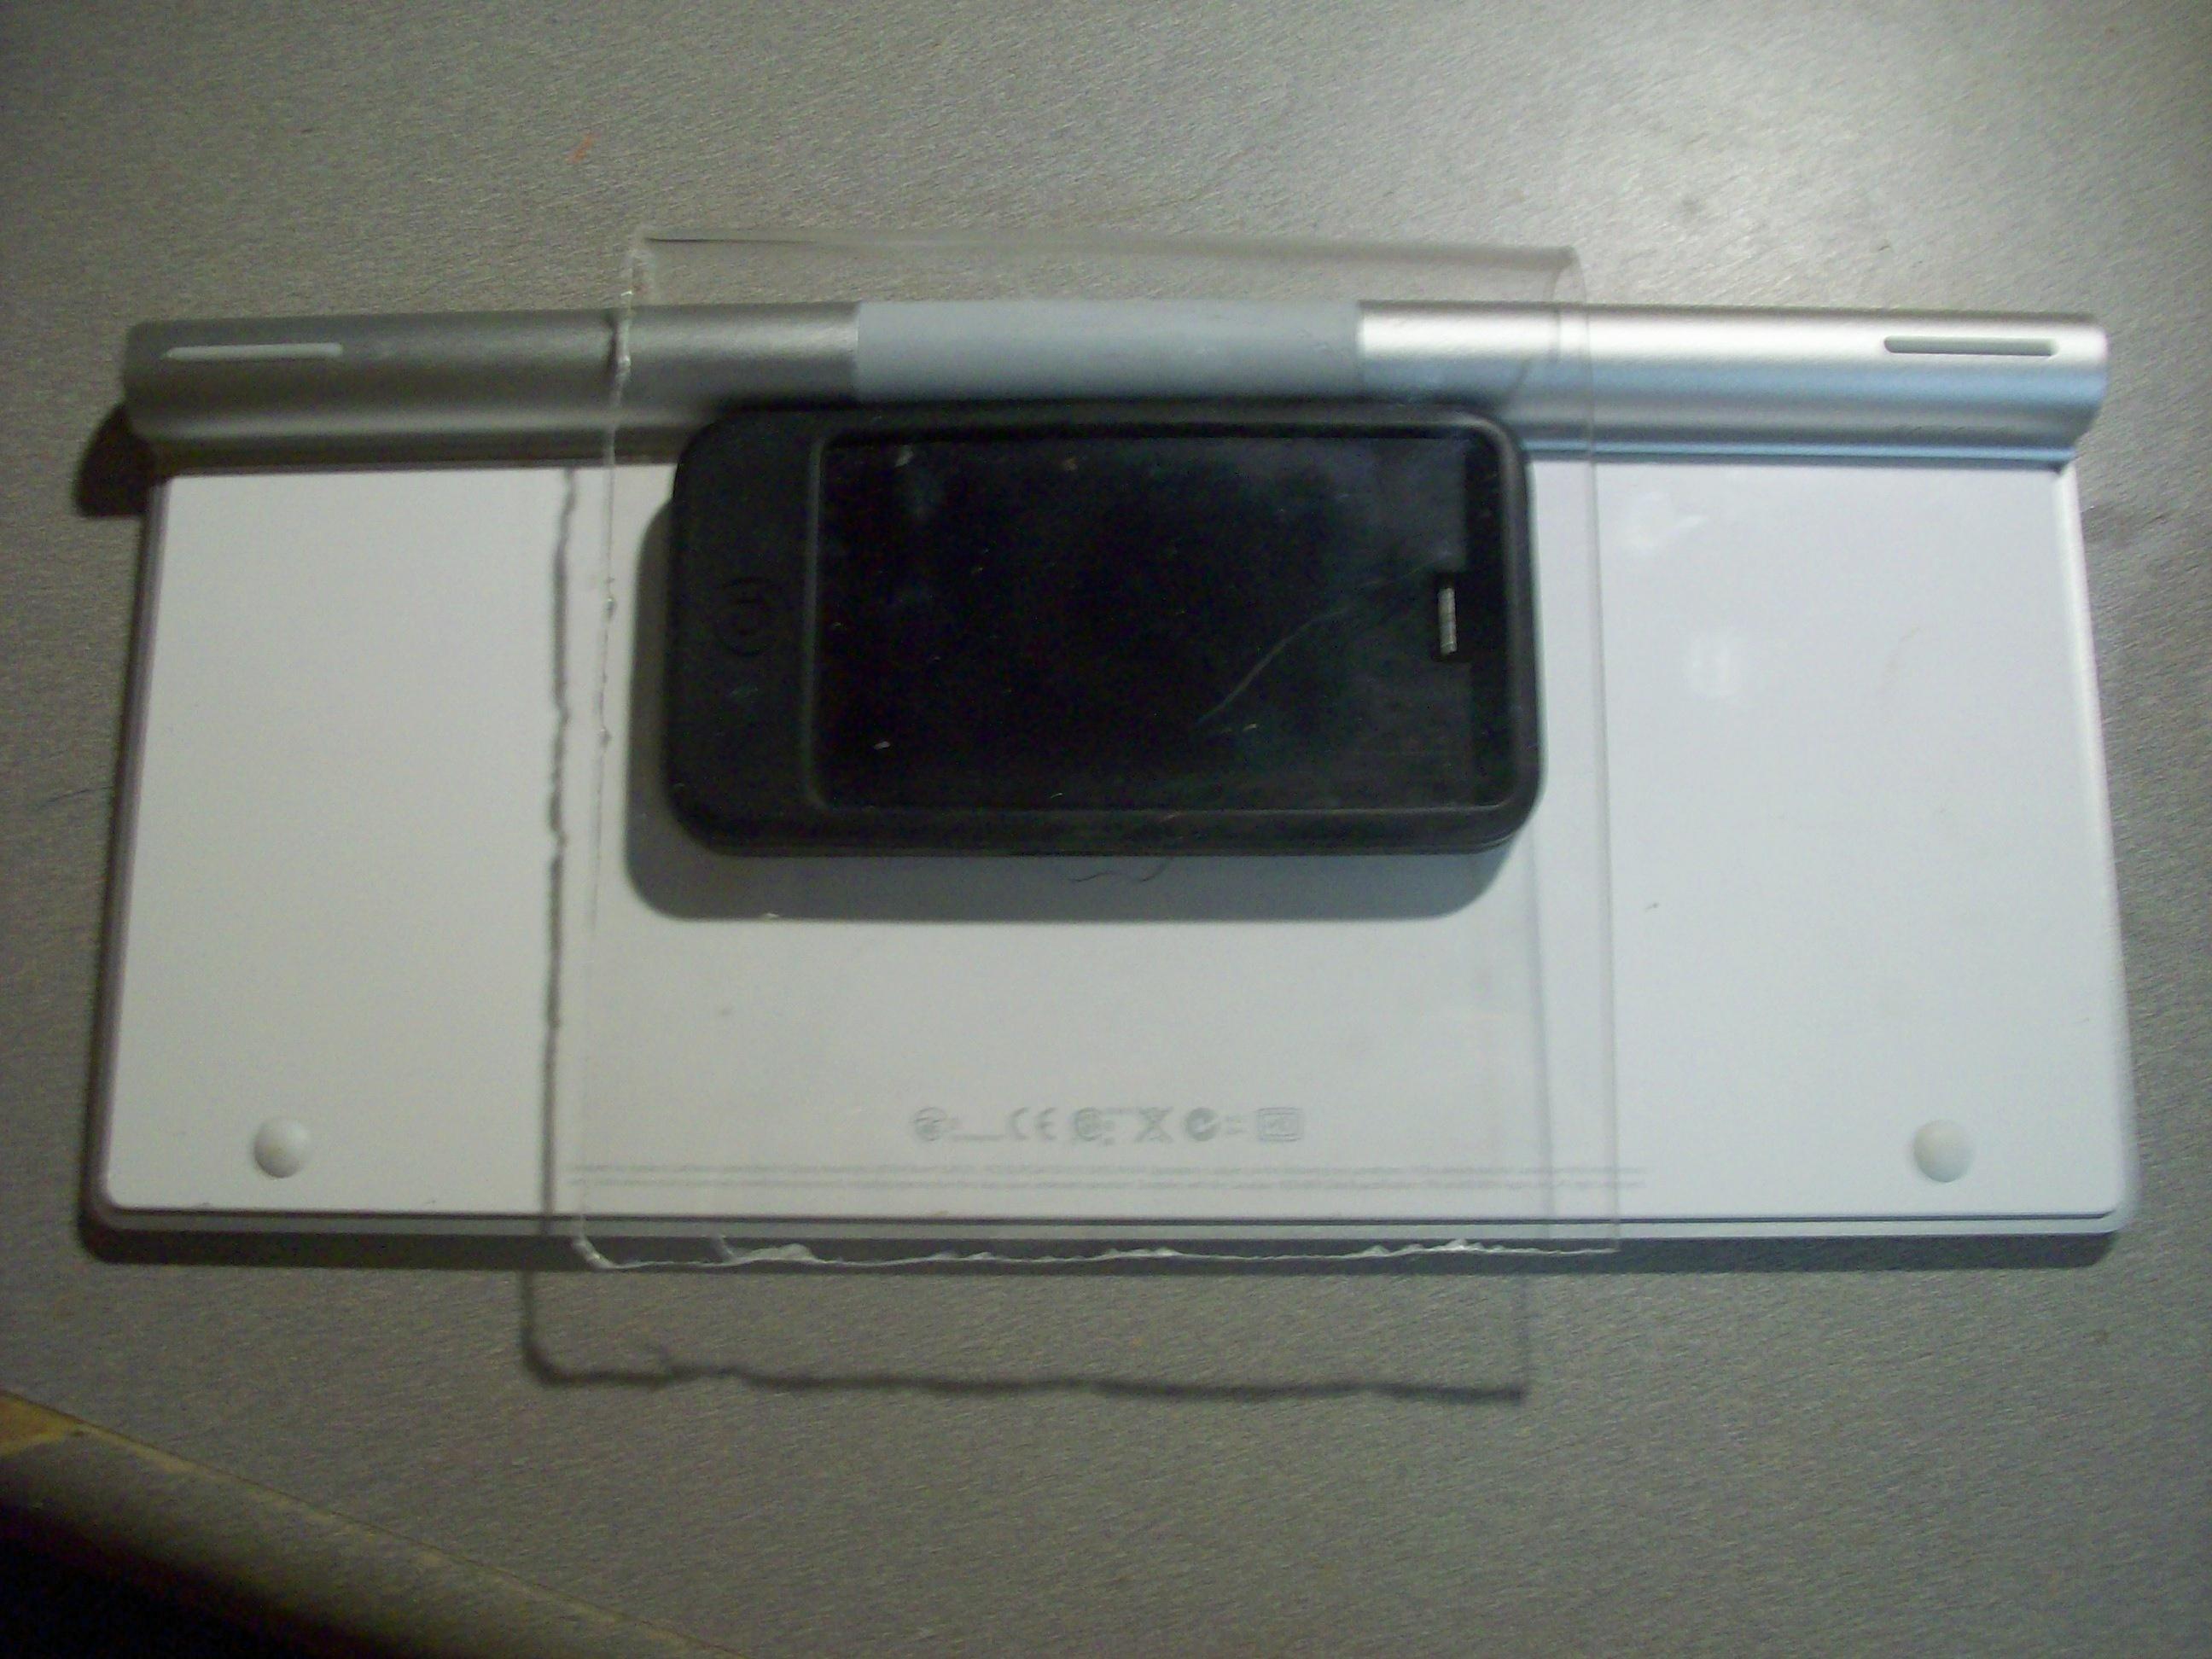 iPhone Keyboard Stand